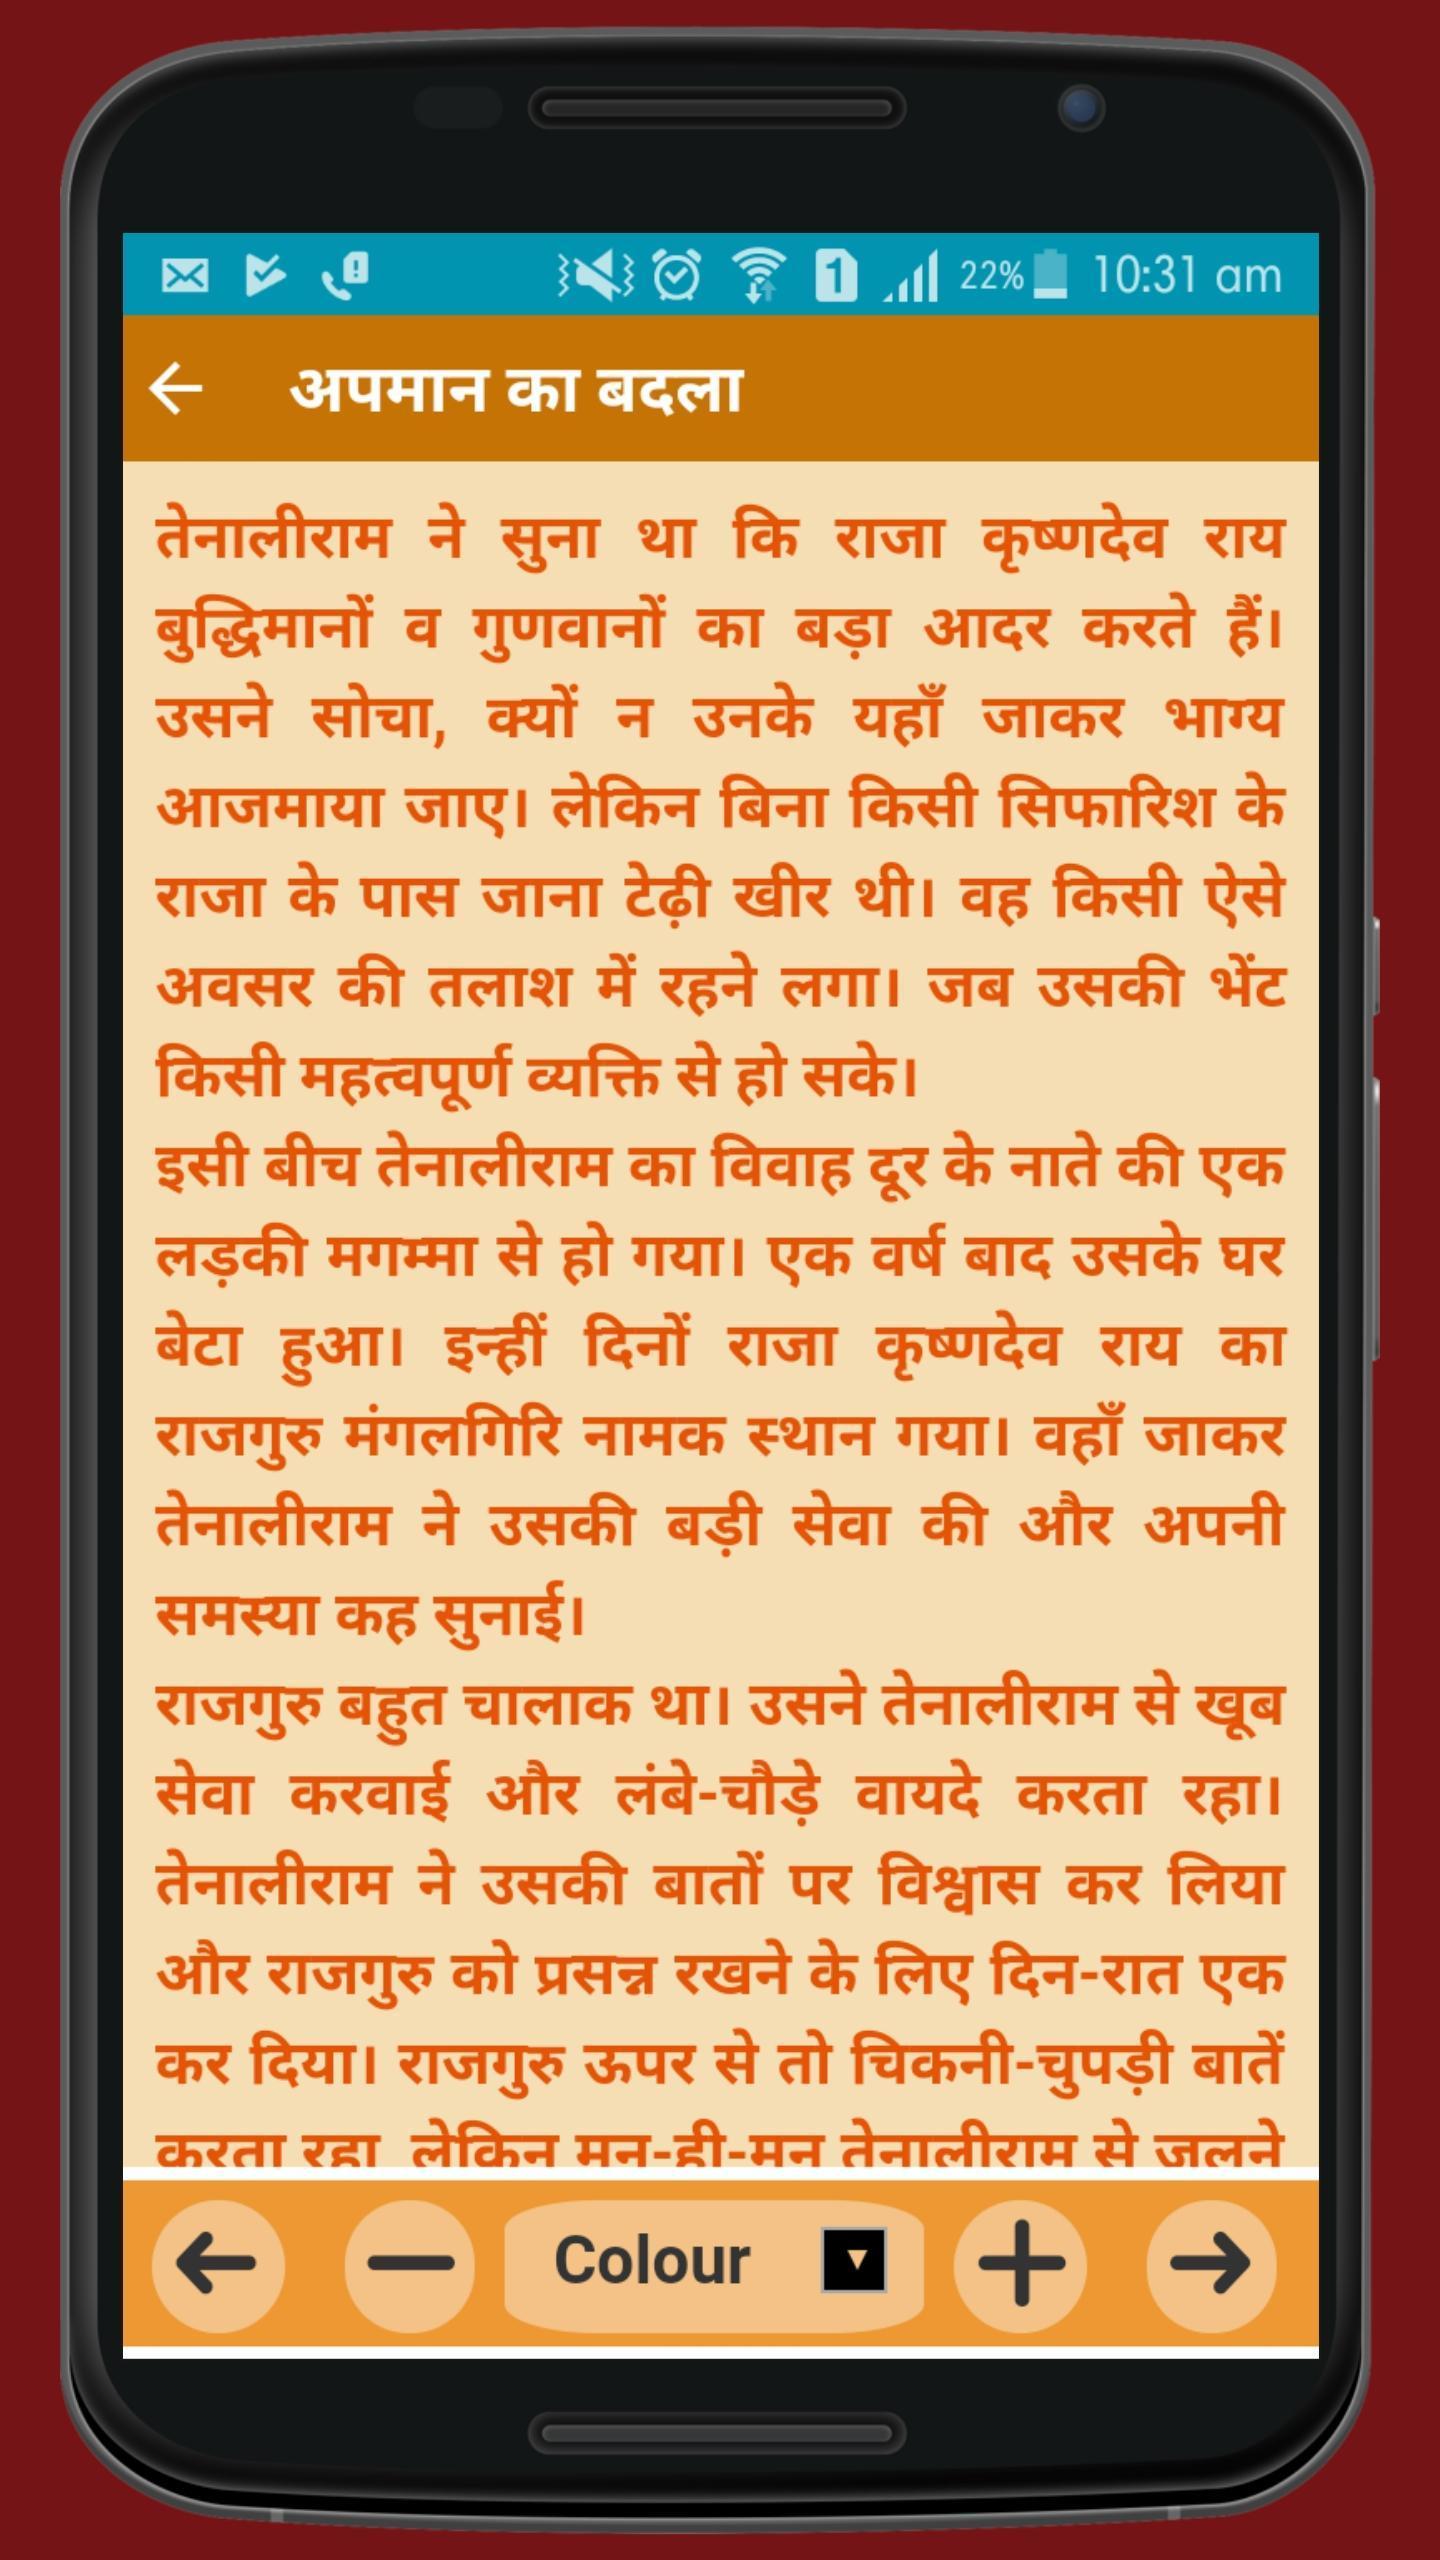 Tenali raman stories in Hindi Offline App for Android - APK